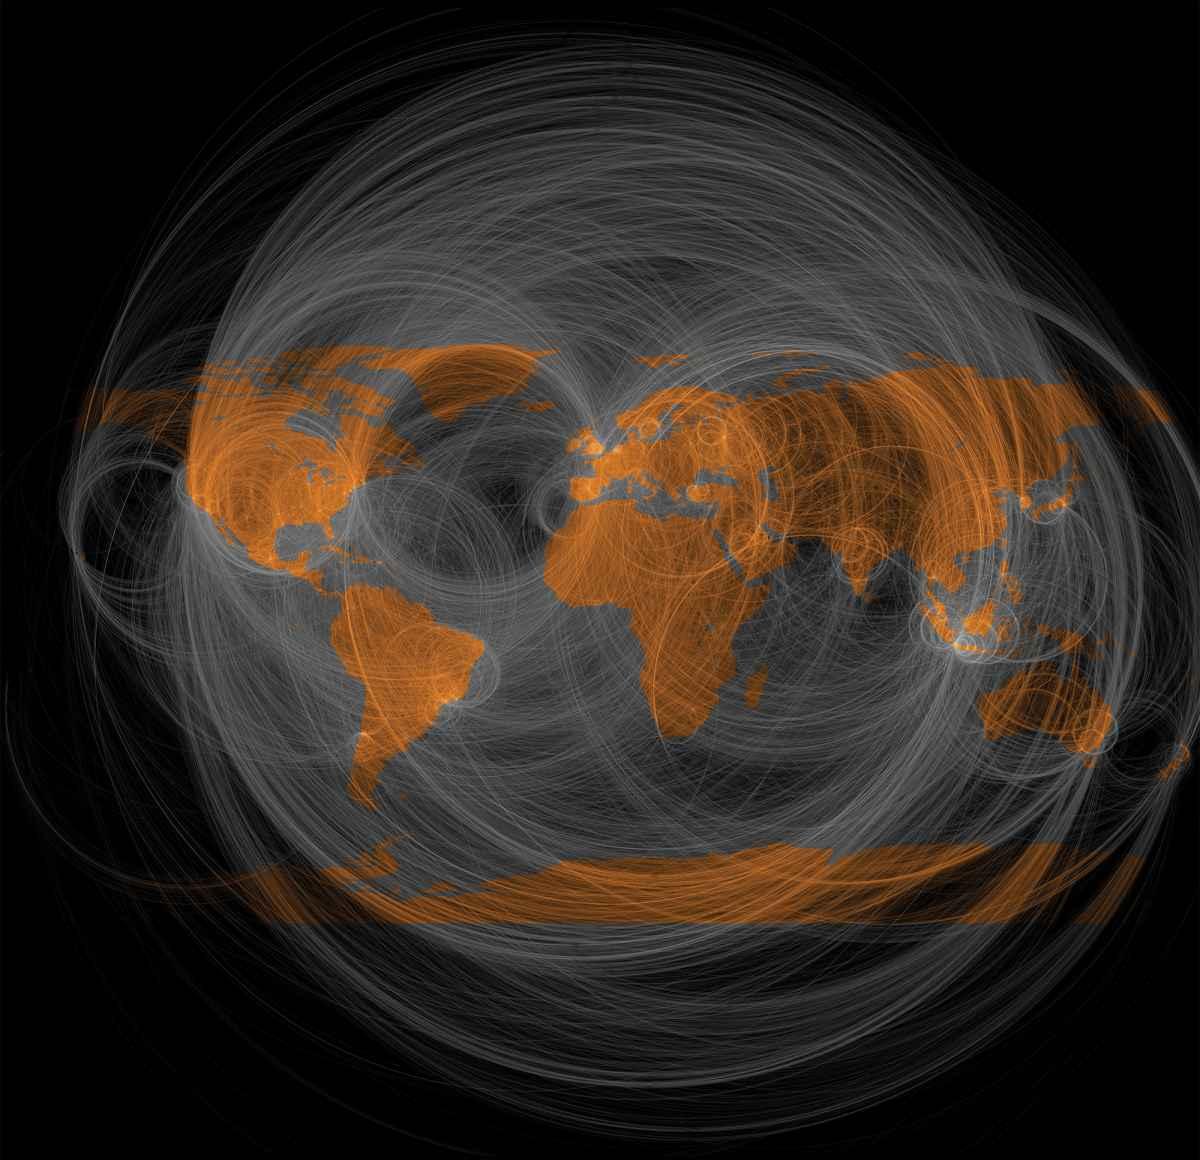 gallery-twitter-tweets-replies-world-map-data-visualization.jpg